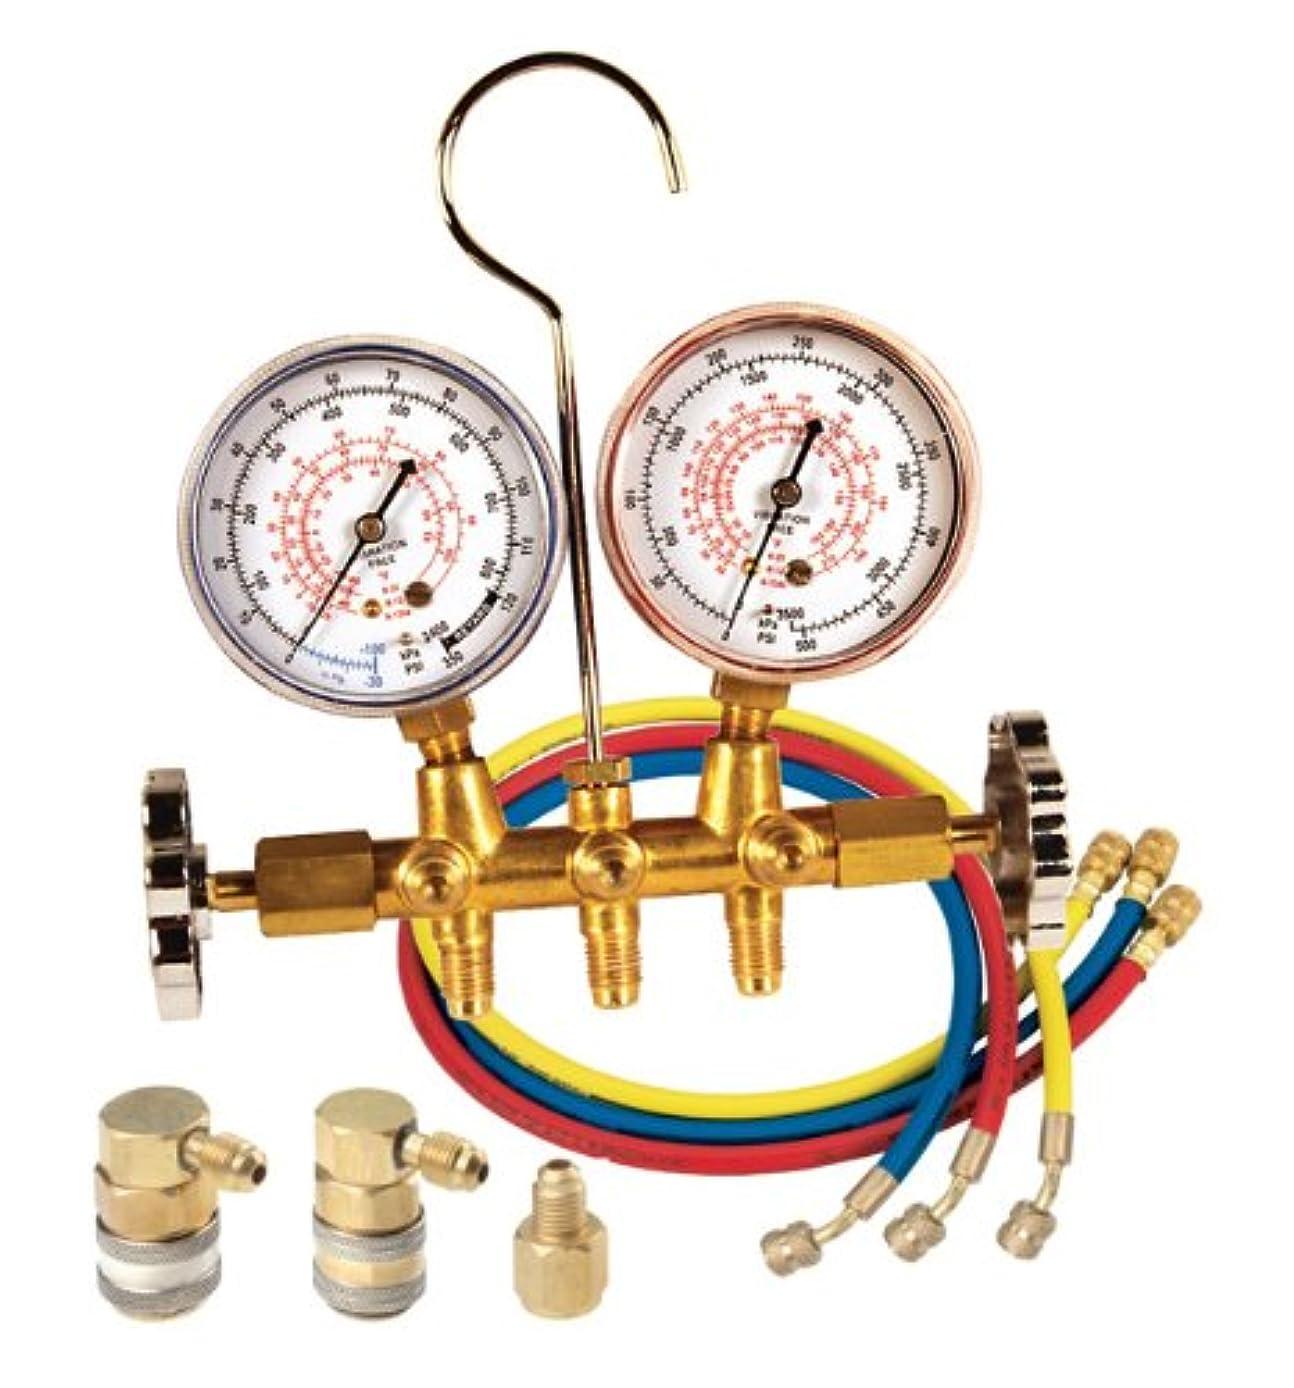 FJC 6692 R12/R134A Brass Dual Manifold Gauge Set